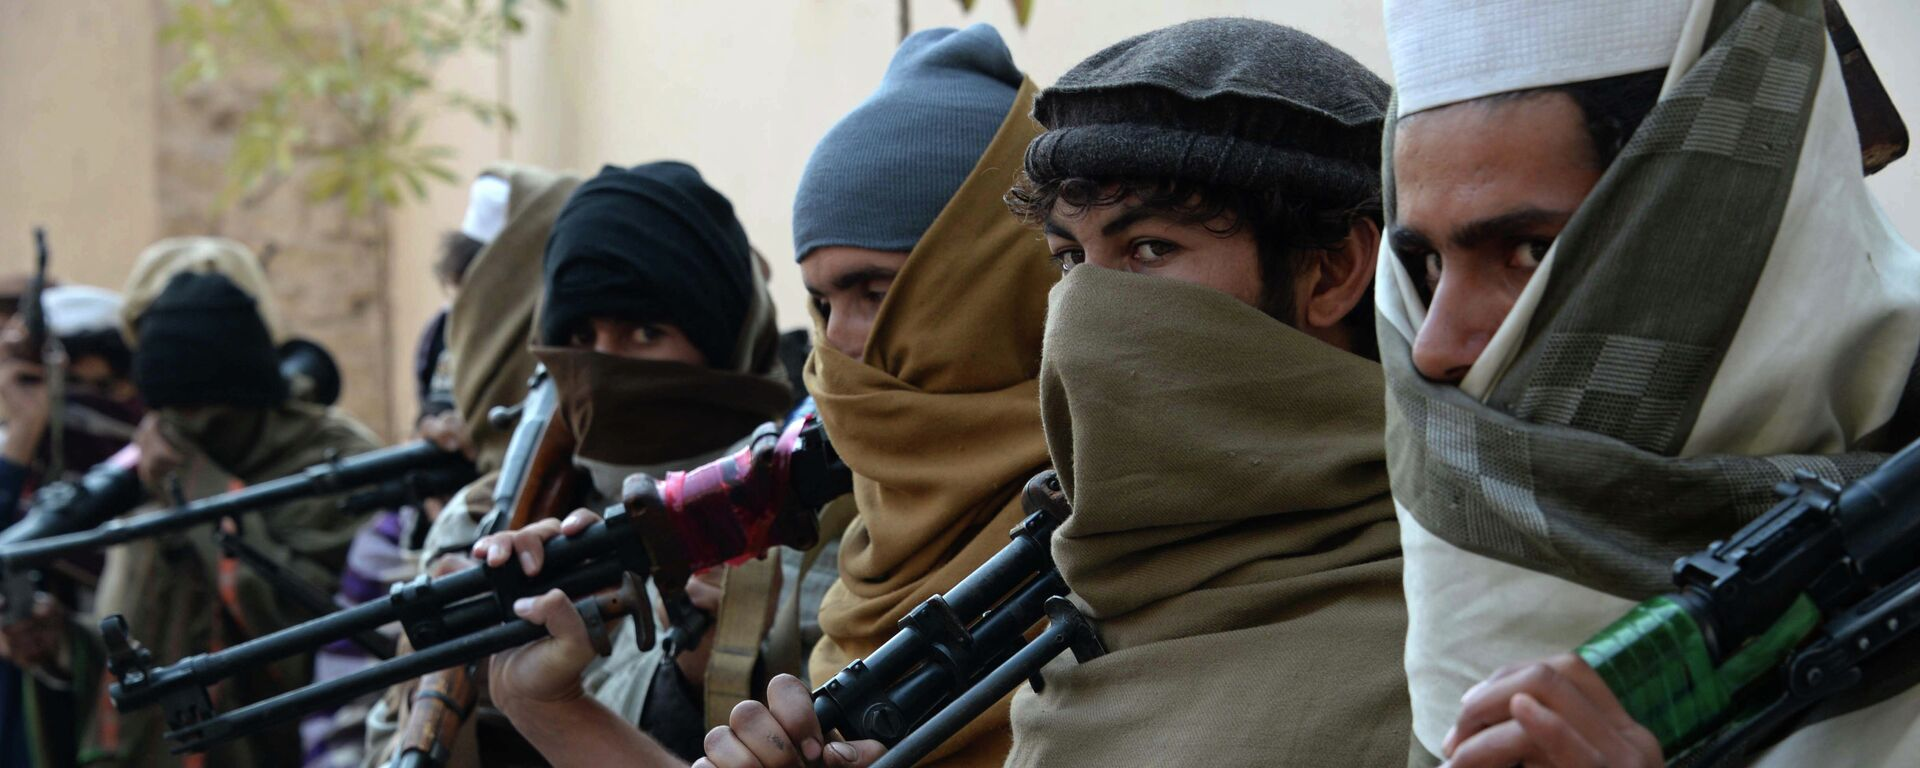 Talibanes afganos (archivo) - Sputnik Mundo, 1920, 01.07.2021